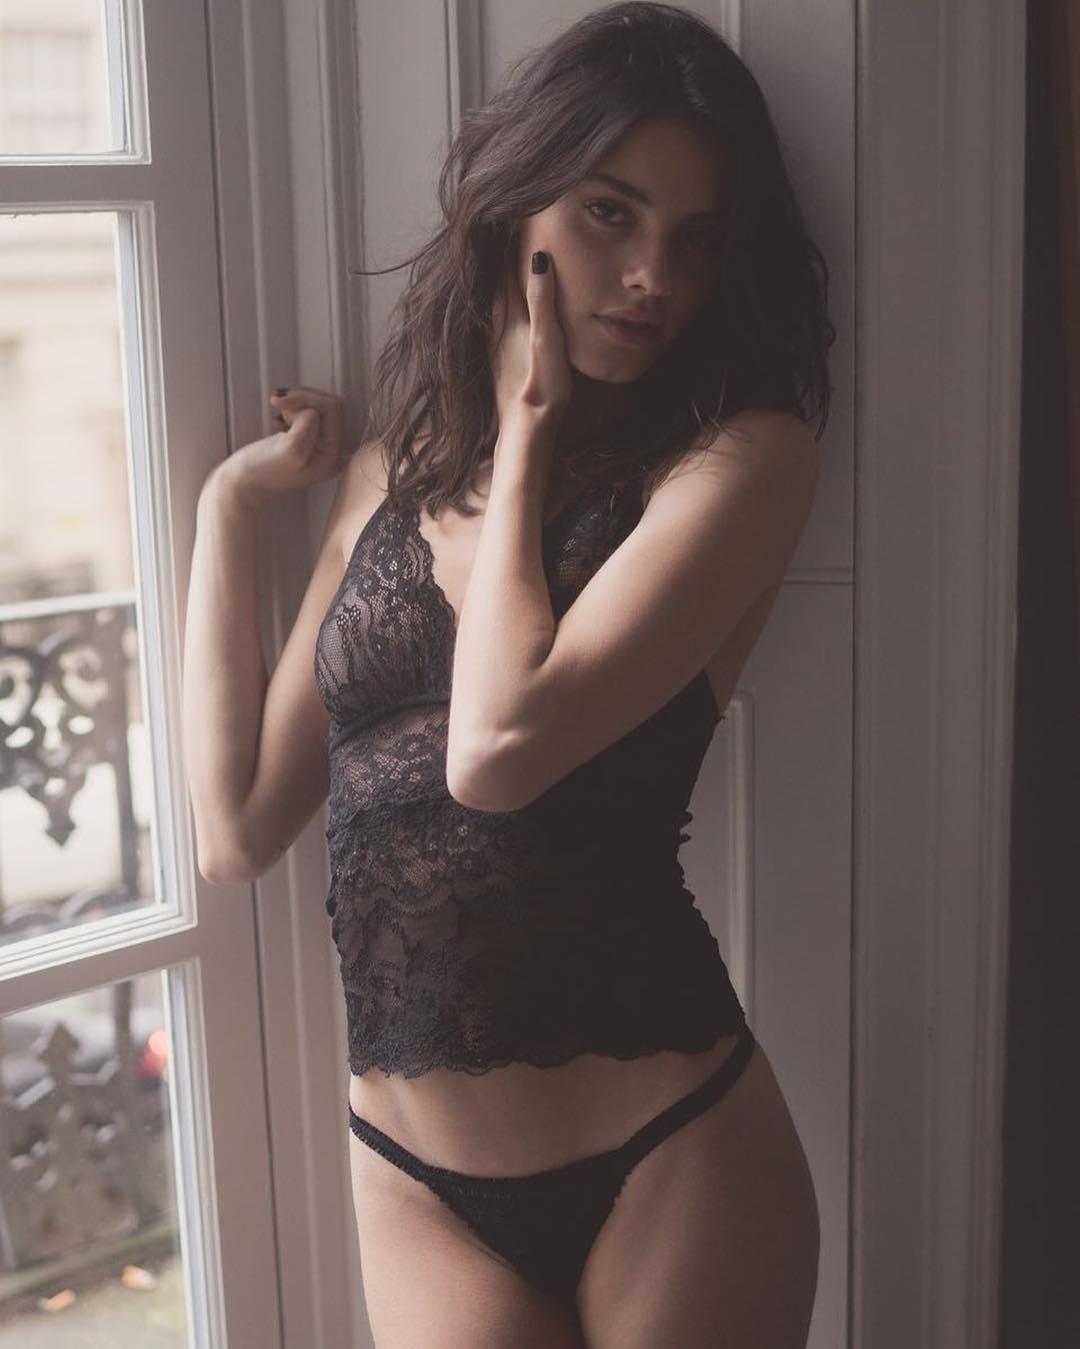 Paparazzi Nataly Machado naked (88 foto and video), Pussy, Cleavage, Feet, in bikini 2020